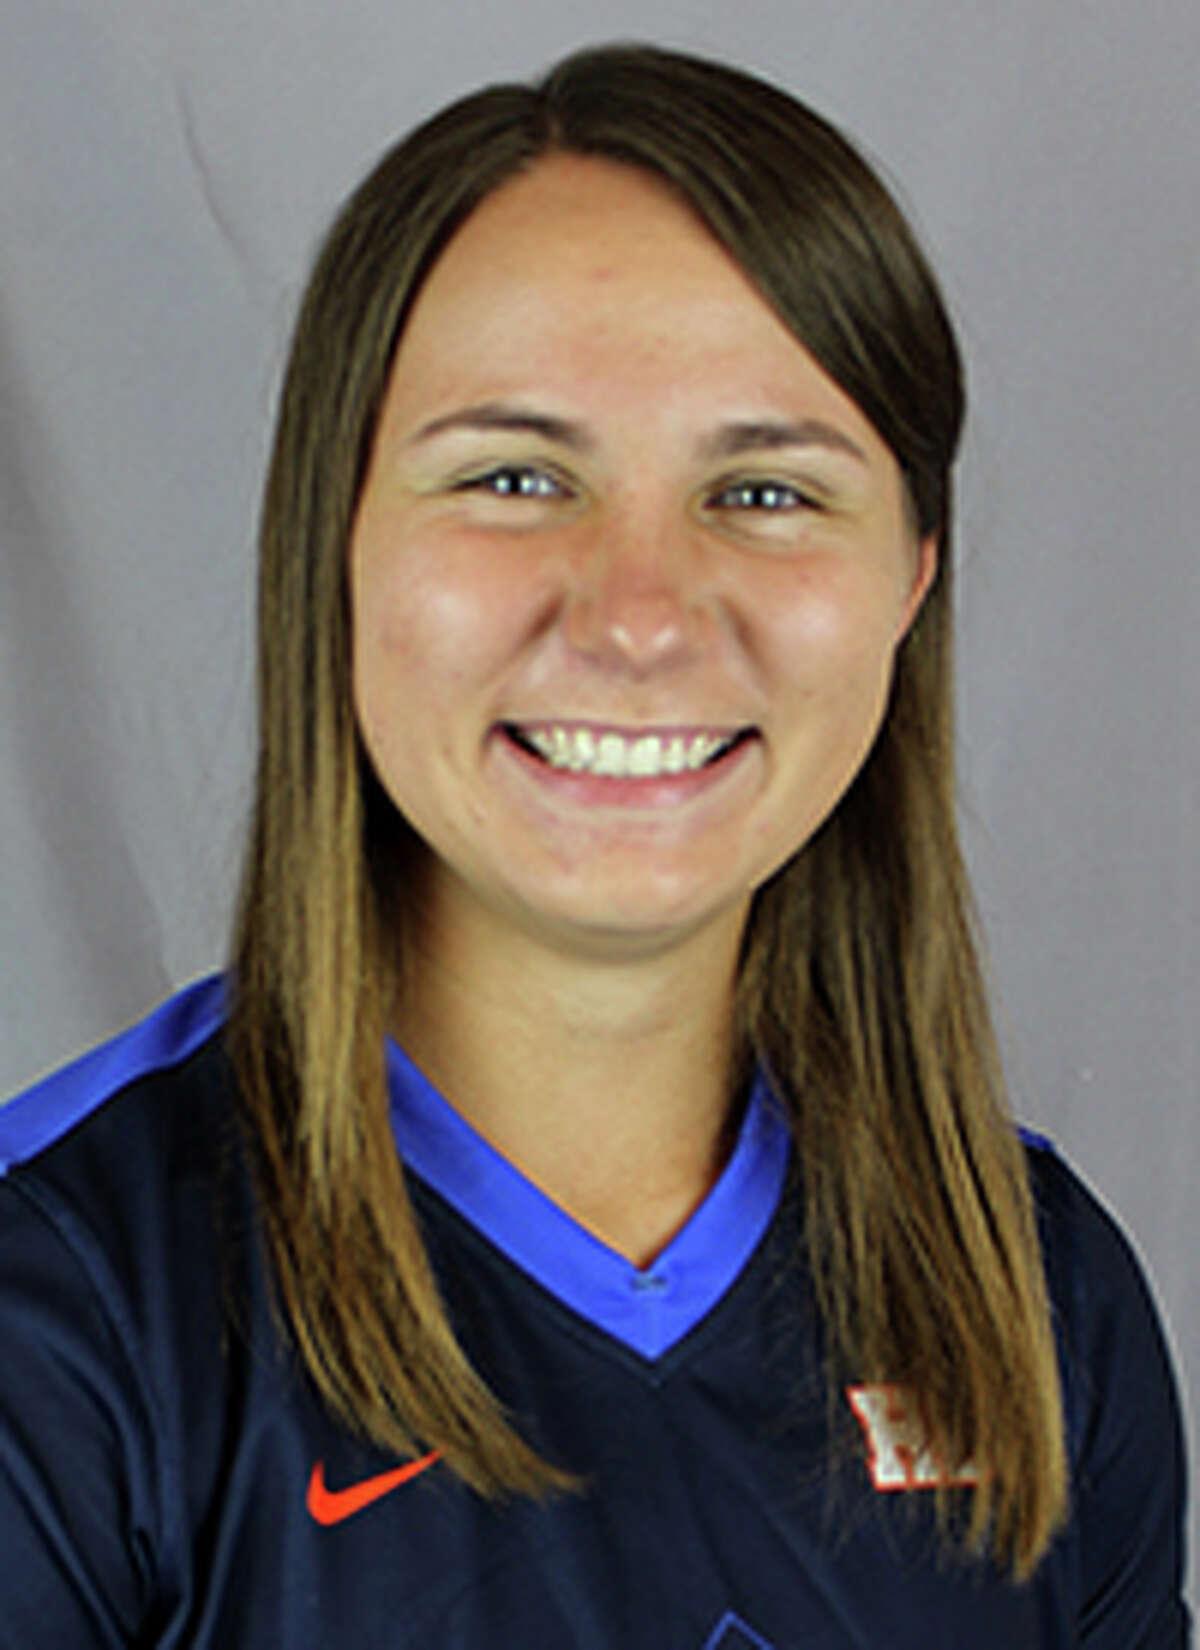 Houston Baptist women's soccer player Allison Abendschein. A 2013 Magnolia High School graduate.